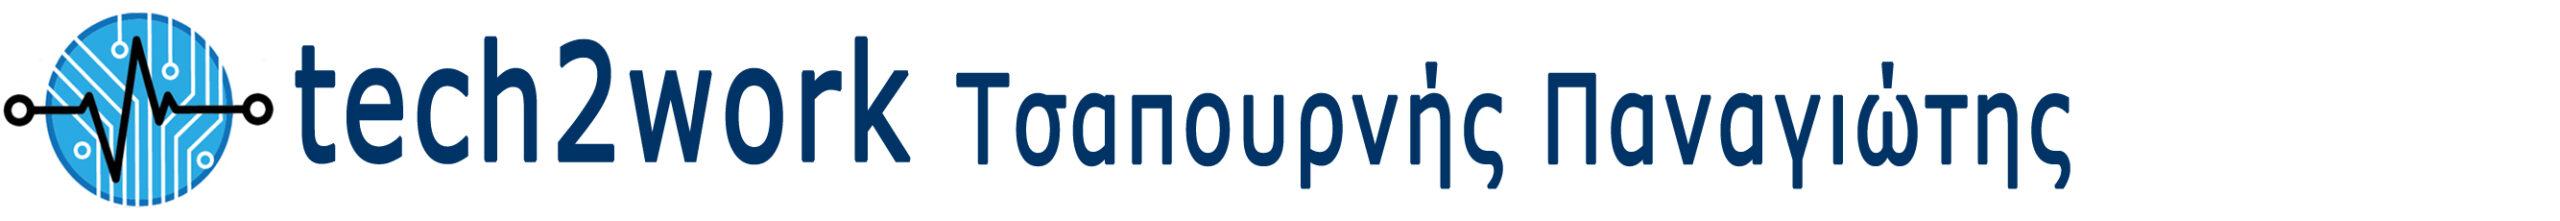 new-logoesp